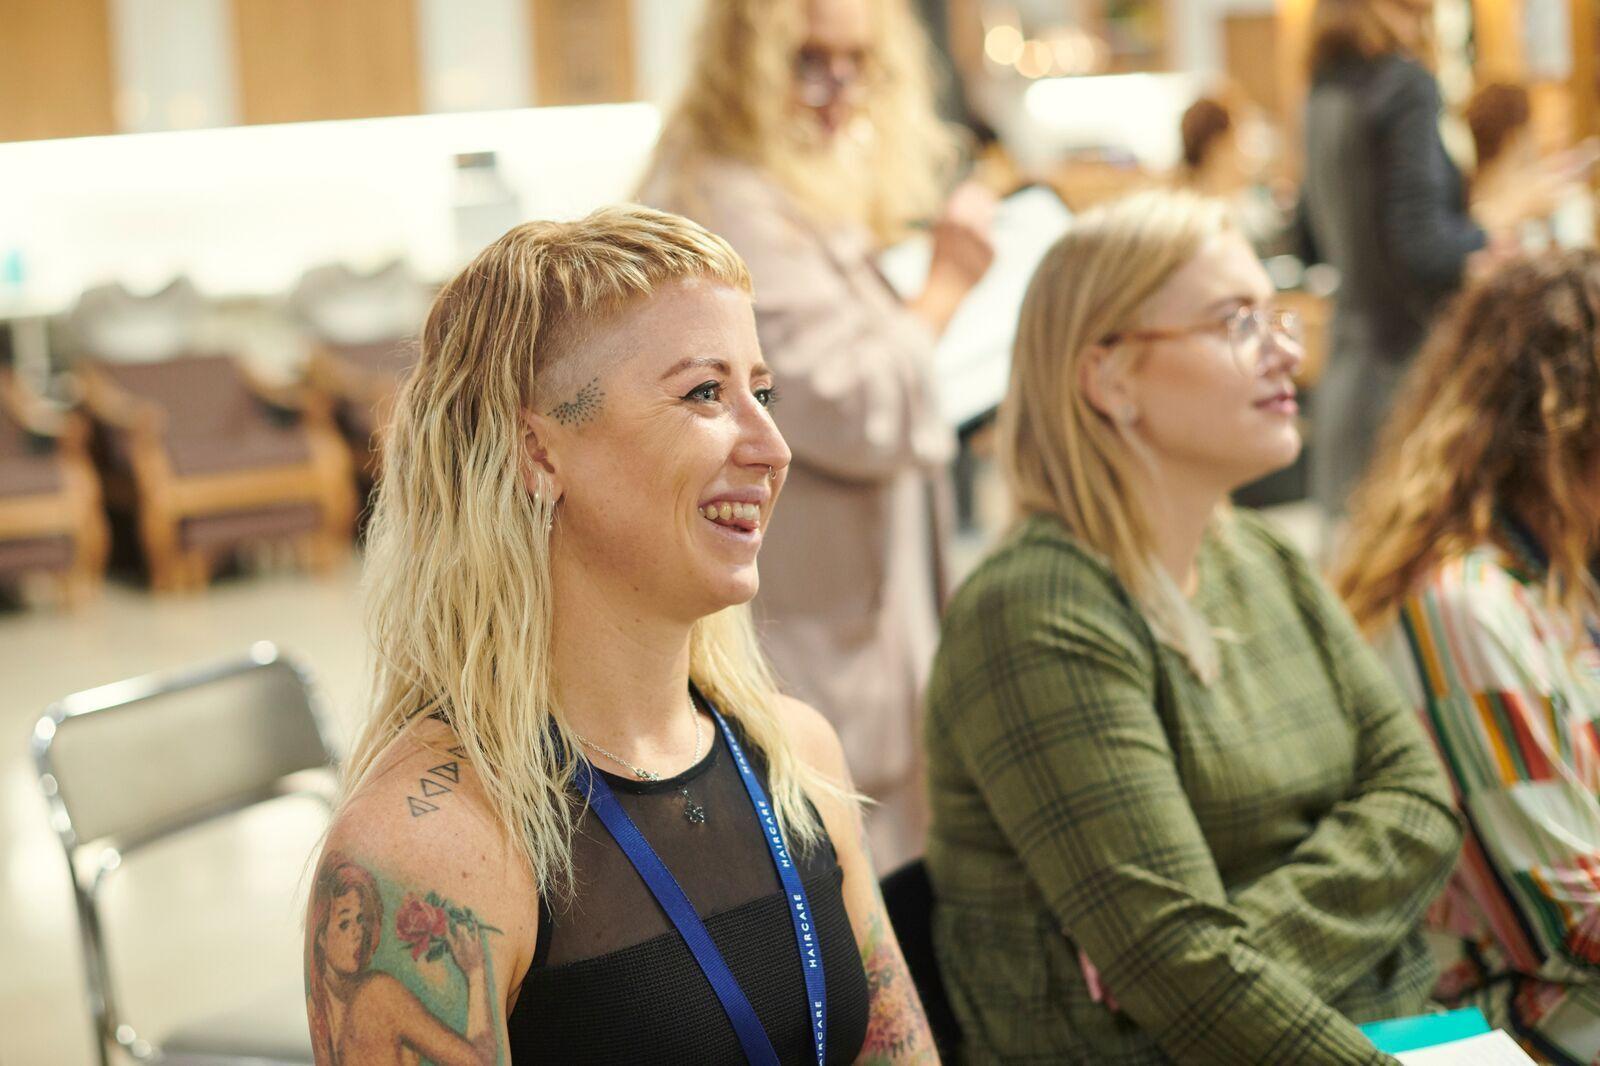 haircare-australia haircare-australia-study-tour-2019 study-tour haircare-australis-study-tour